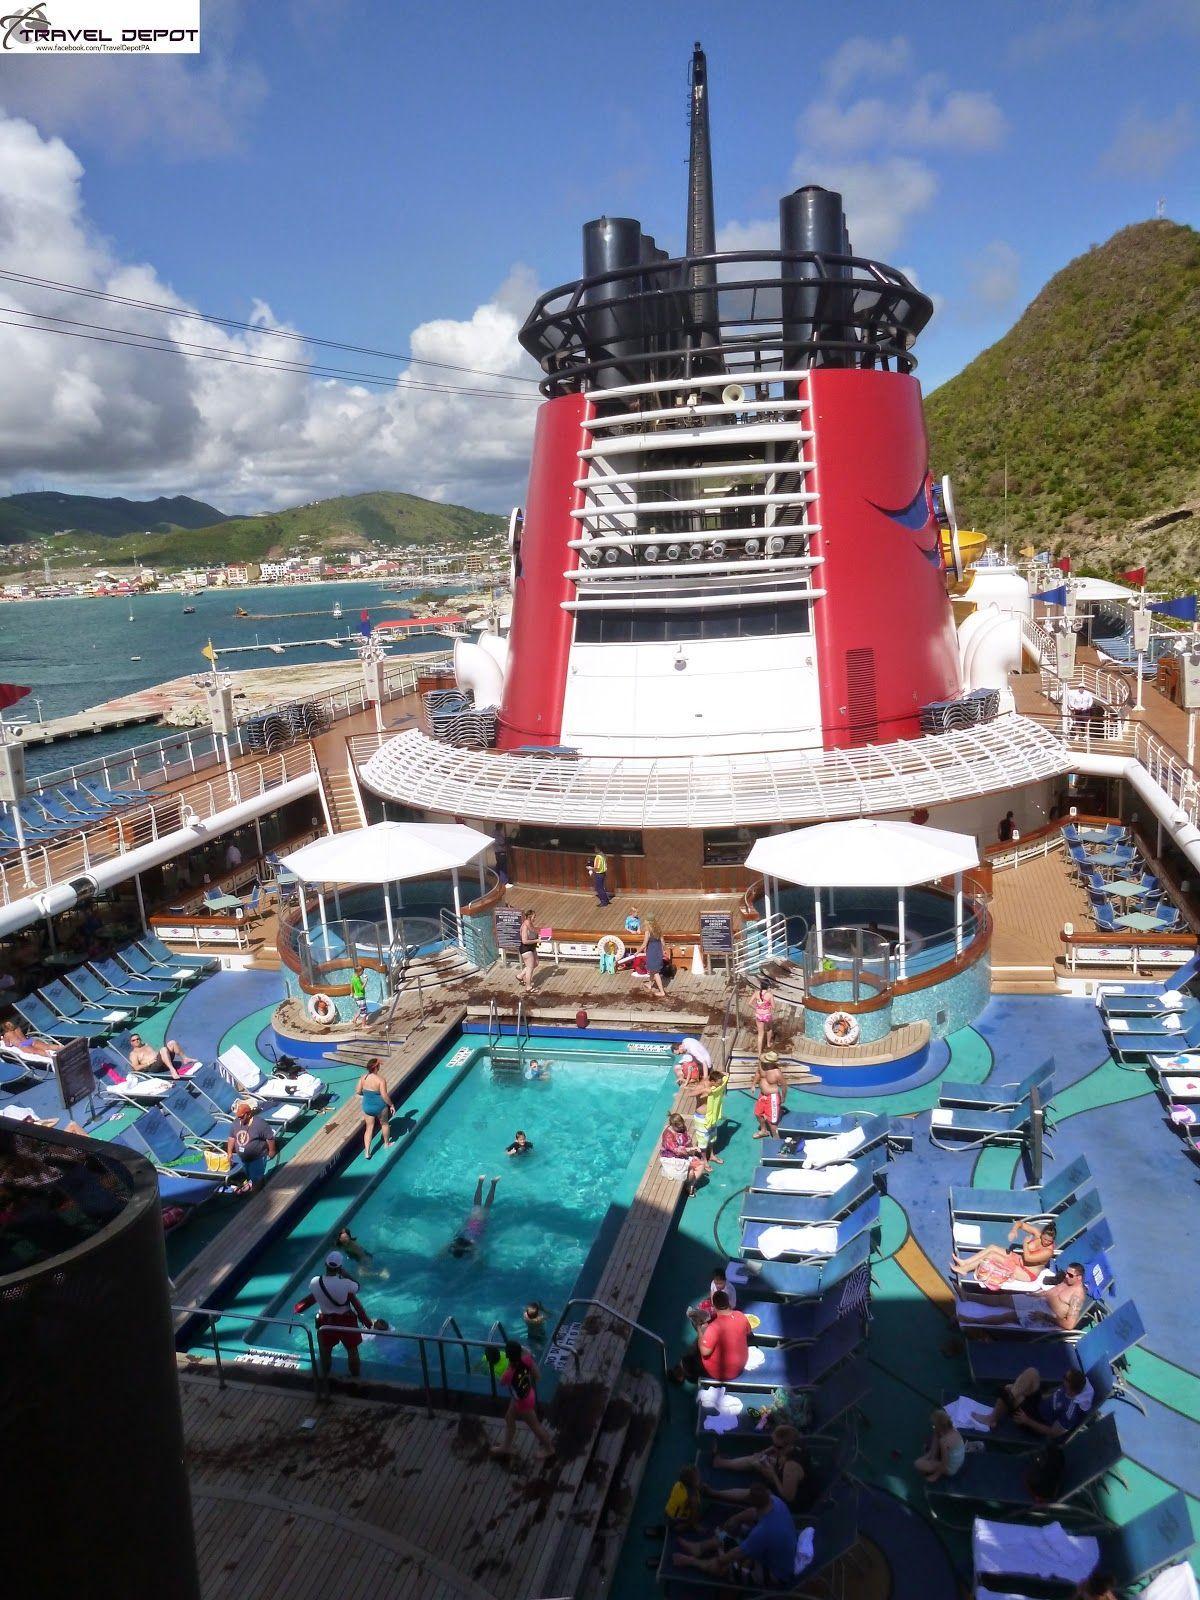 Pool Areas Aboard The Disney Magic Cruise Ship Travel Depot - Disney magic cruise ship pictures